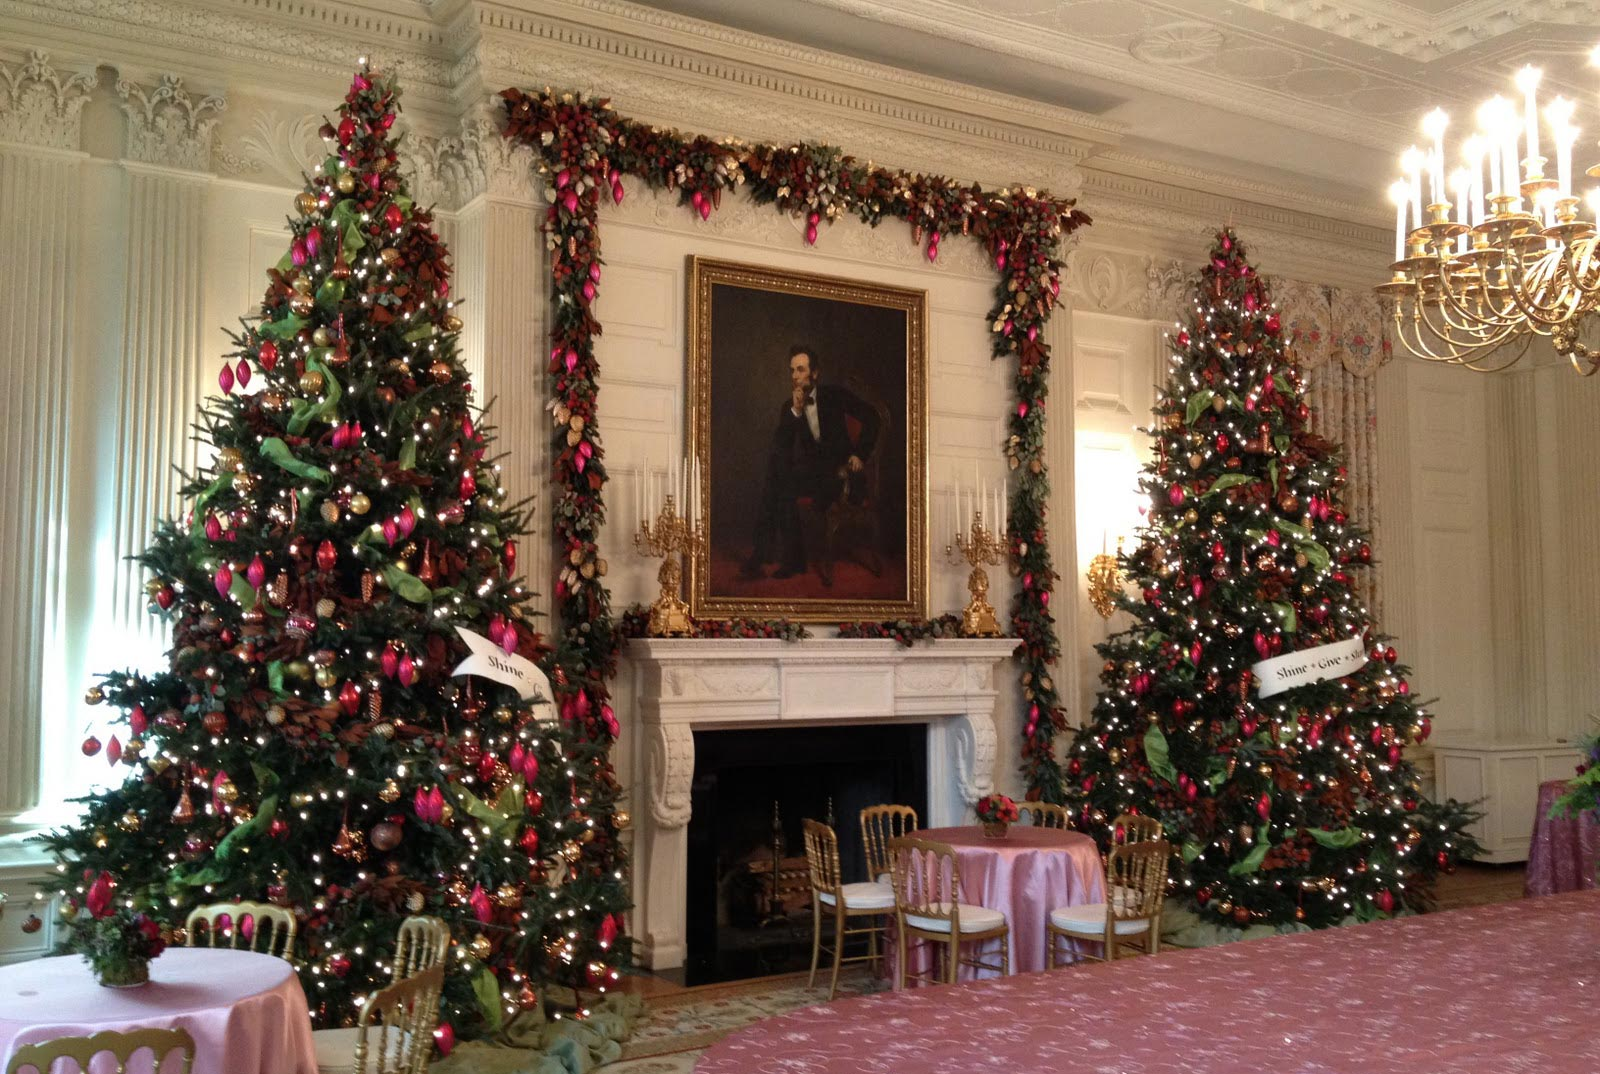 Simple Christmas Tree Decorations Philippines.Christmas Tree Decorations Ideas For 2013 30 Tree Images